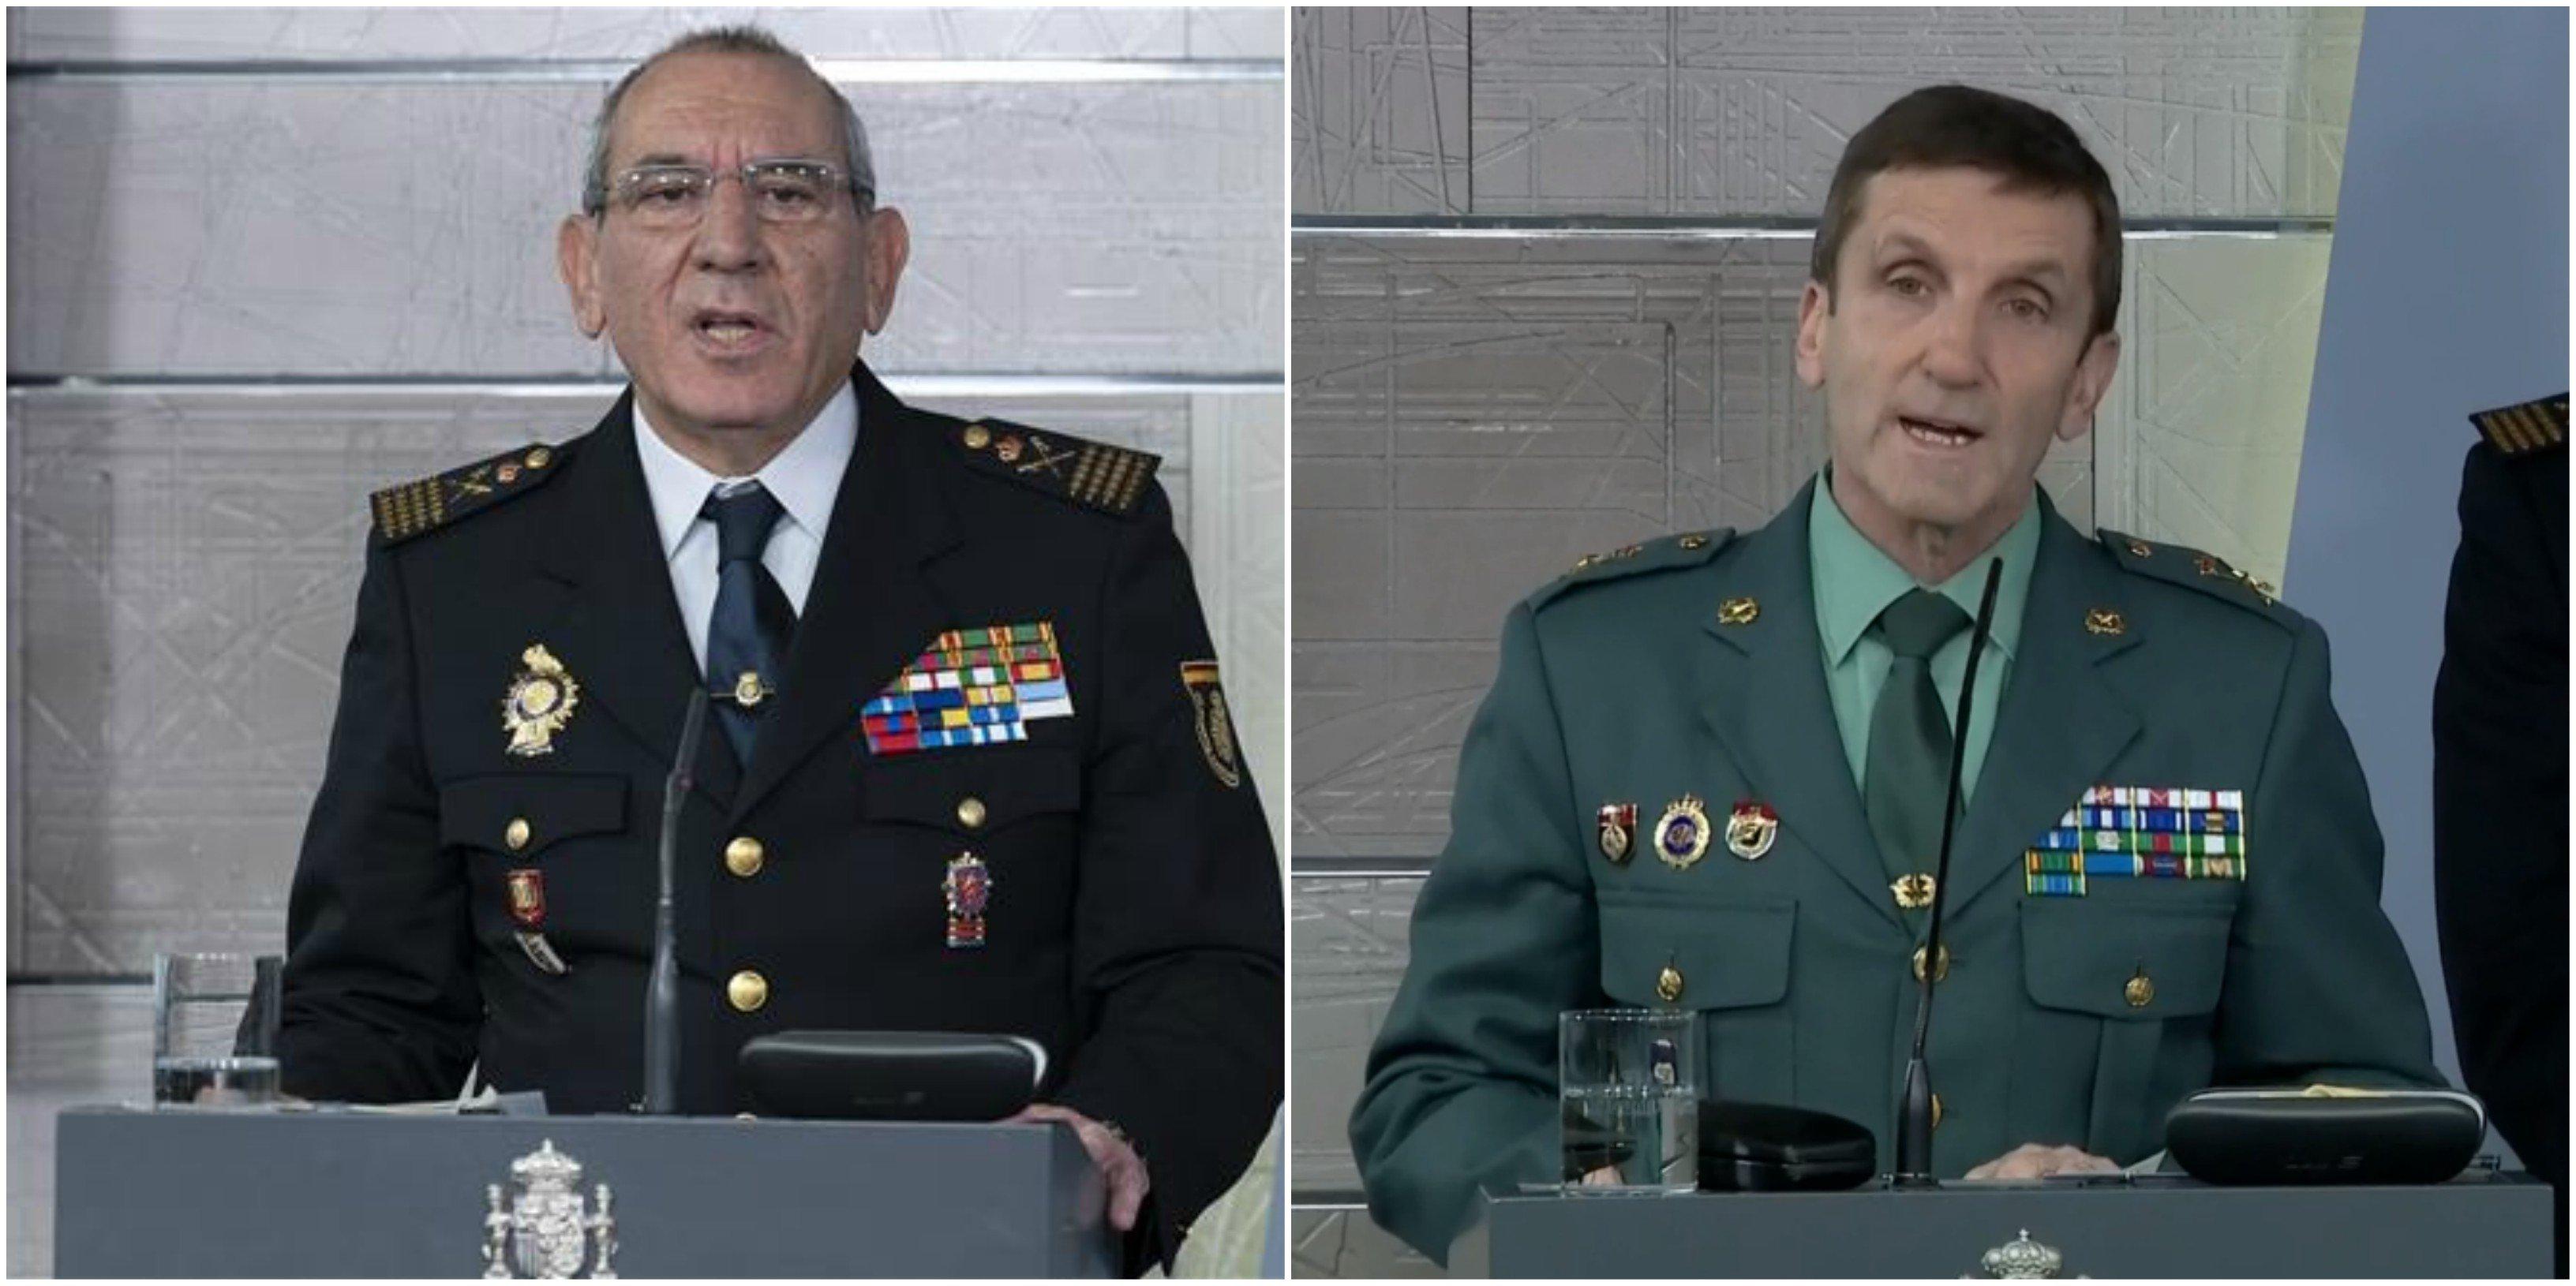 José Ángel González y José Manuel Santiago Marín